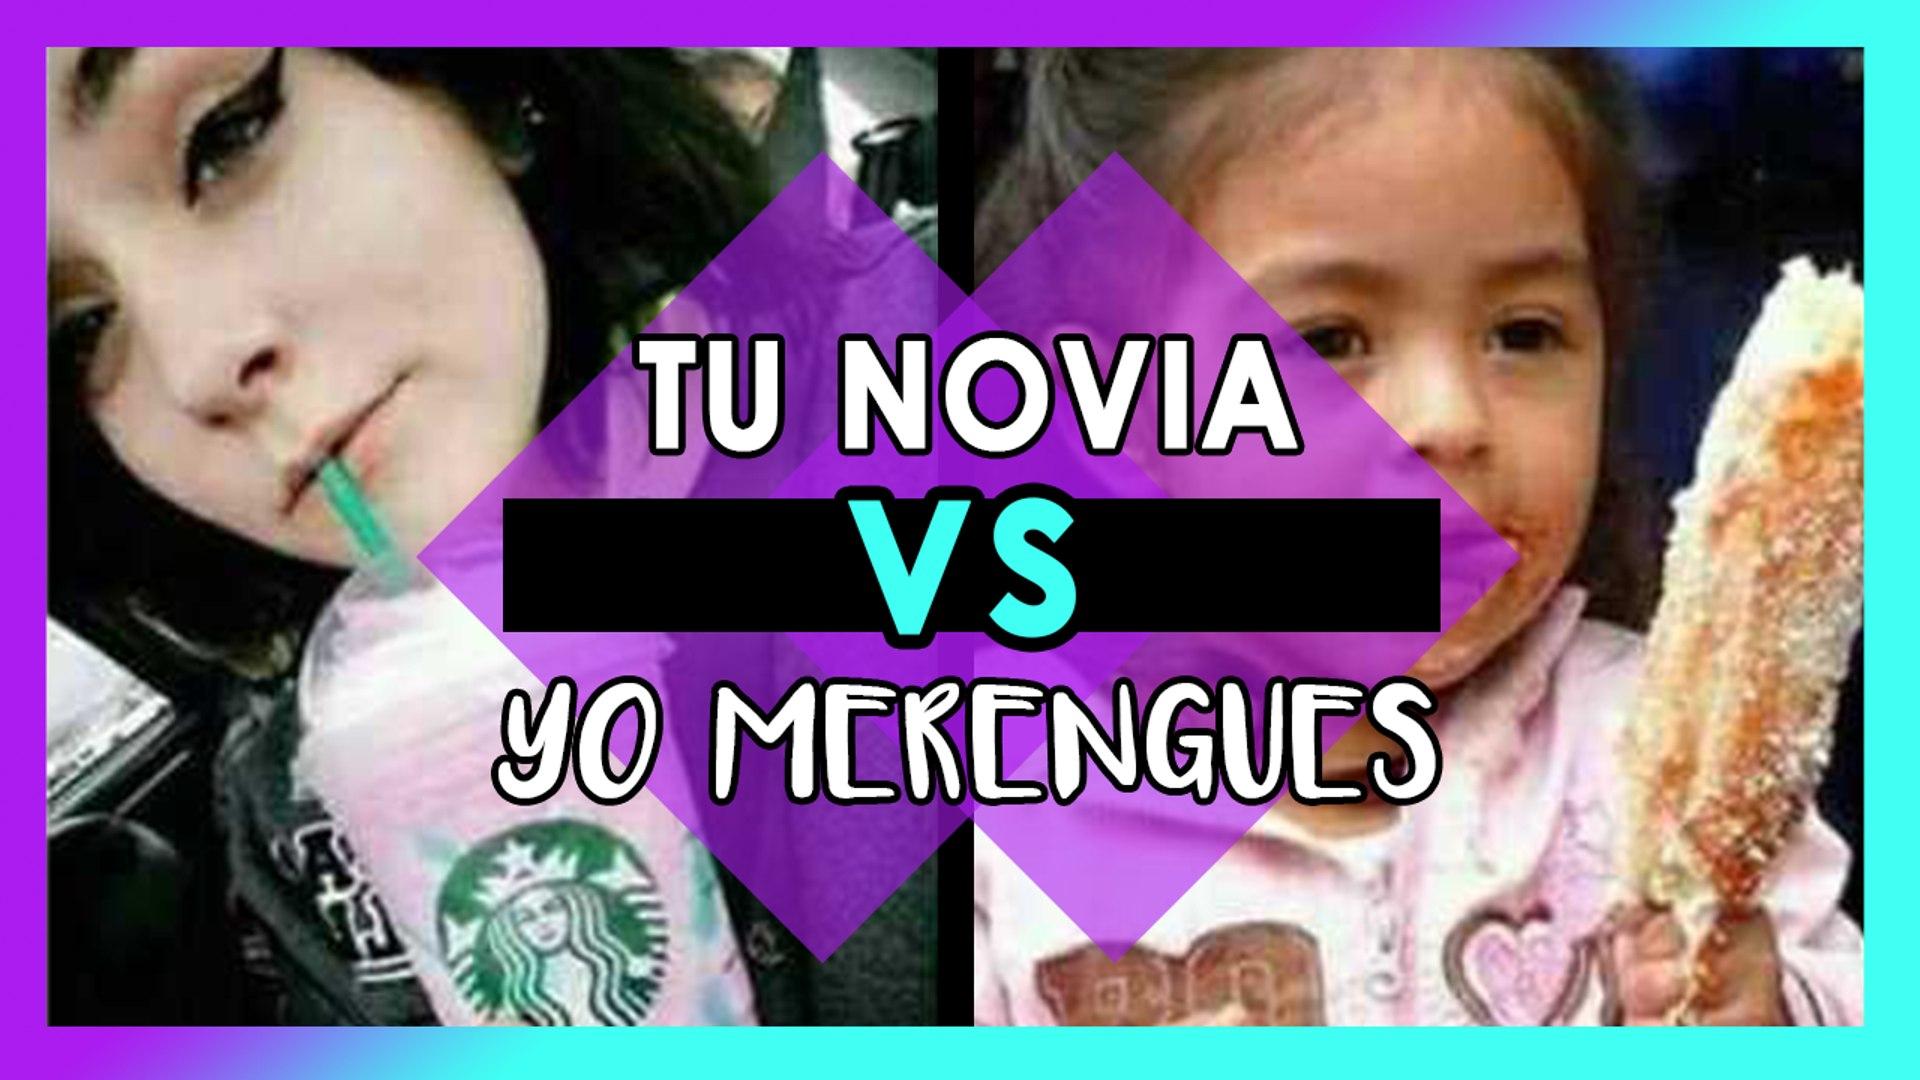 Tu novia LA FRESA vs. YO MERENGUES - Vídeo Dailymotion